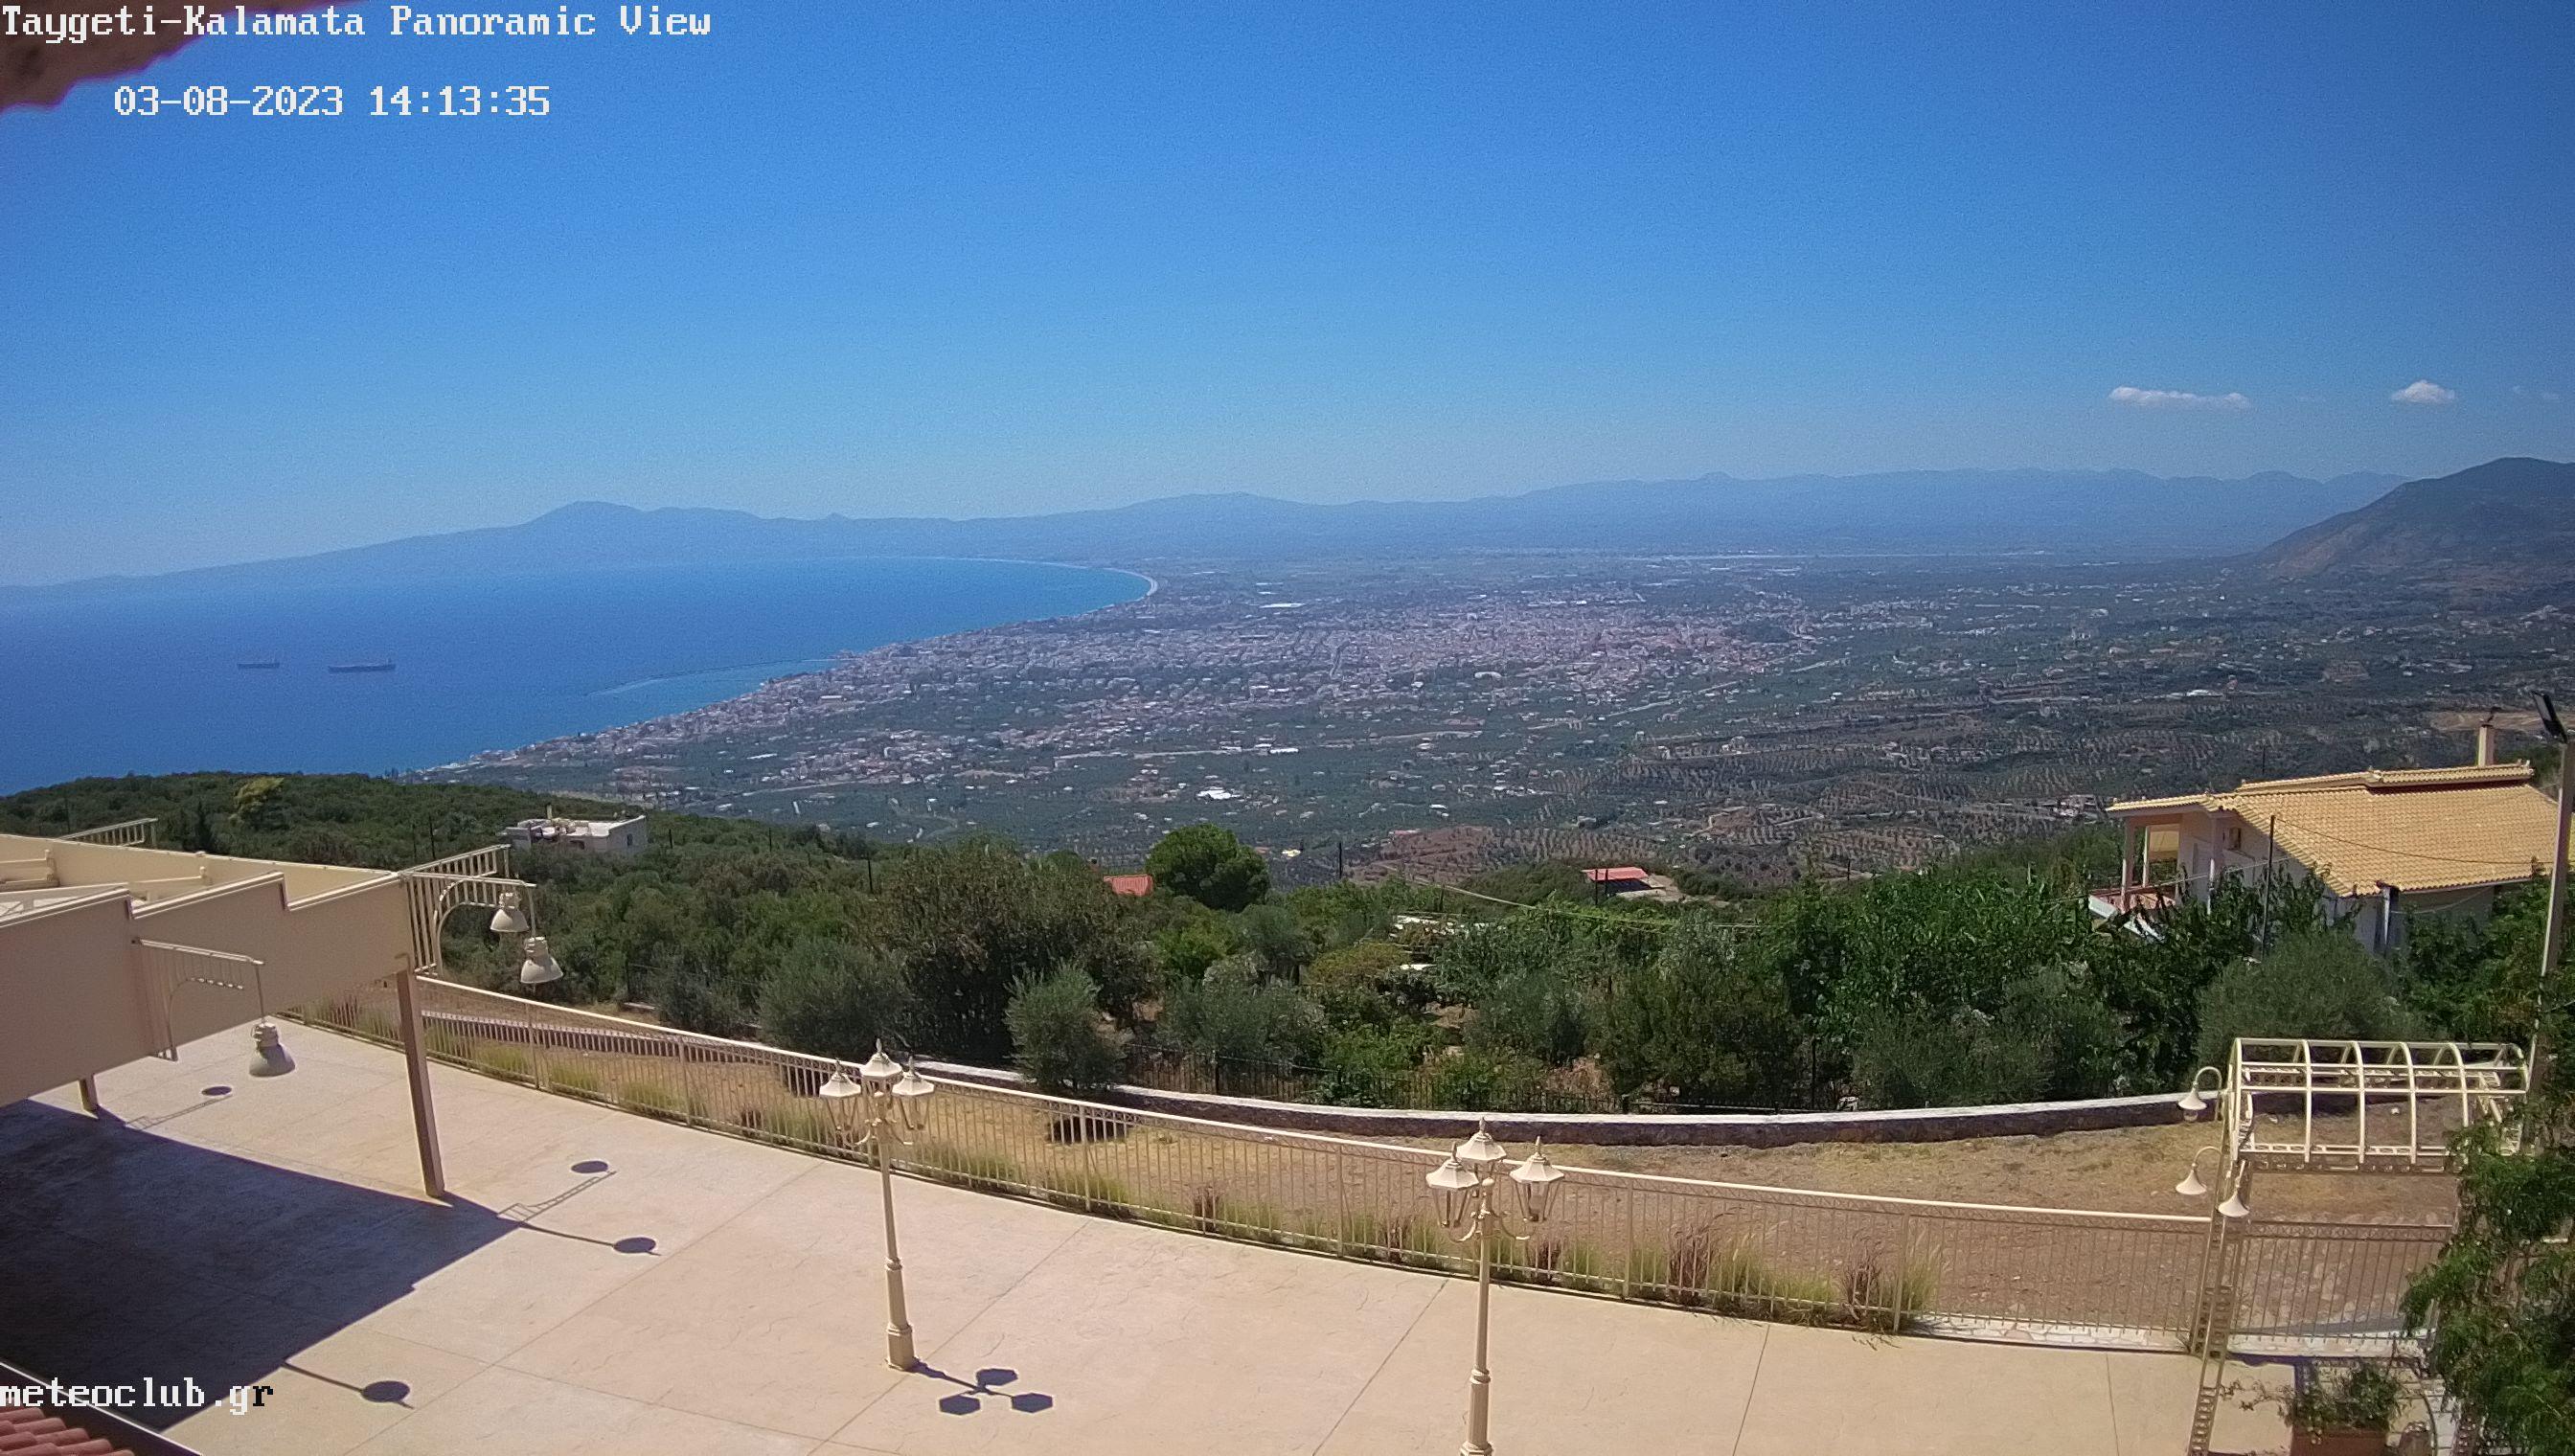 Webcam Ταΰγετος - υψόμετρο 2.032μ